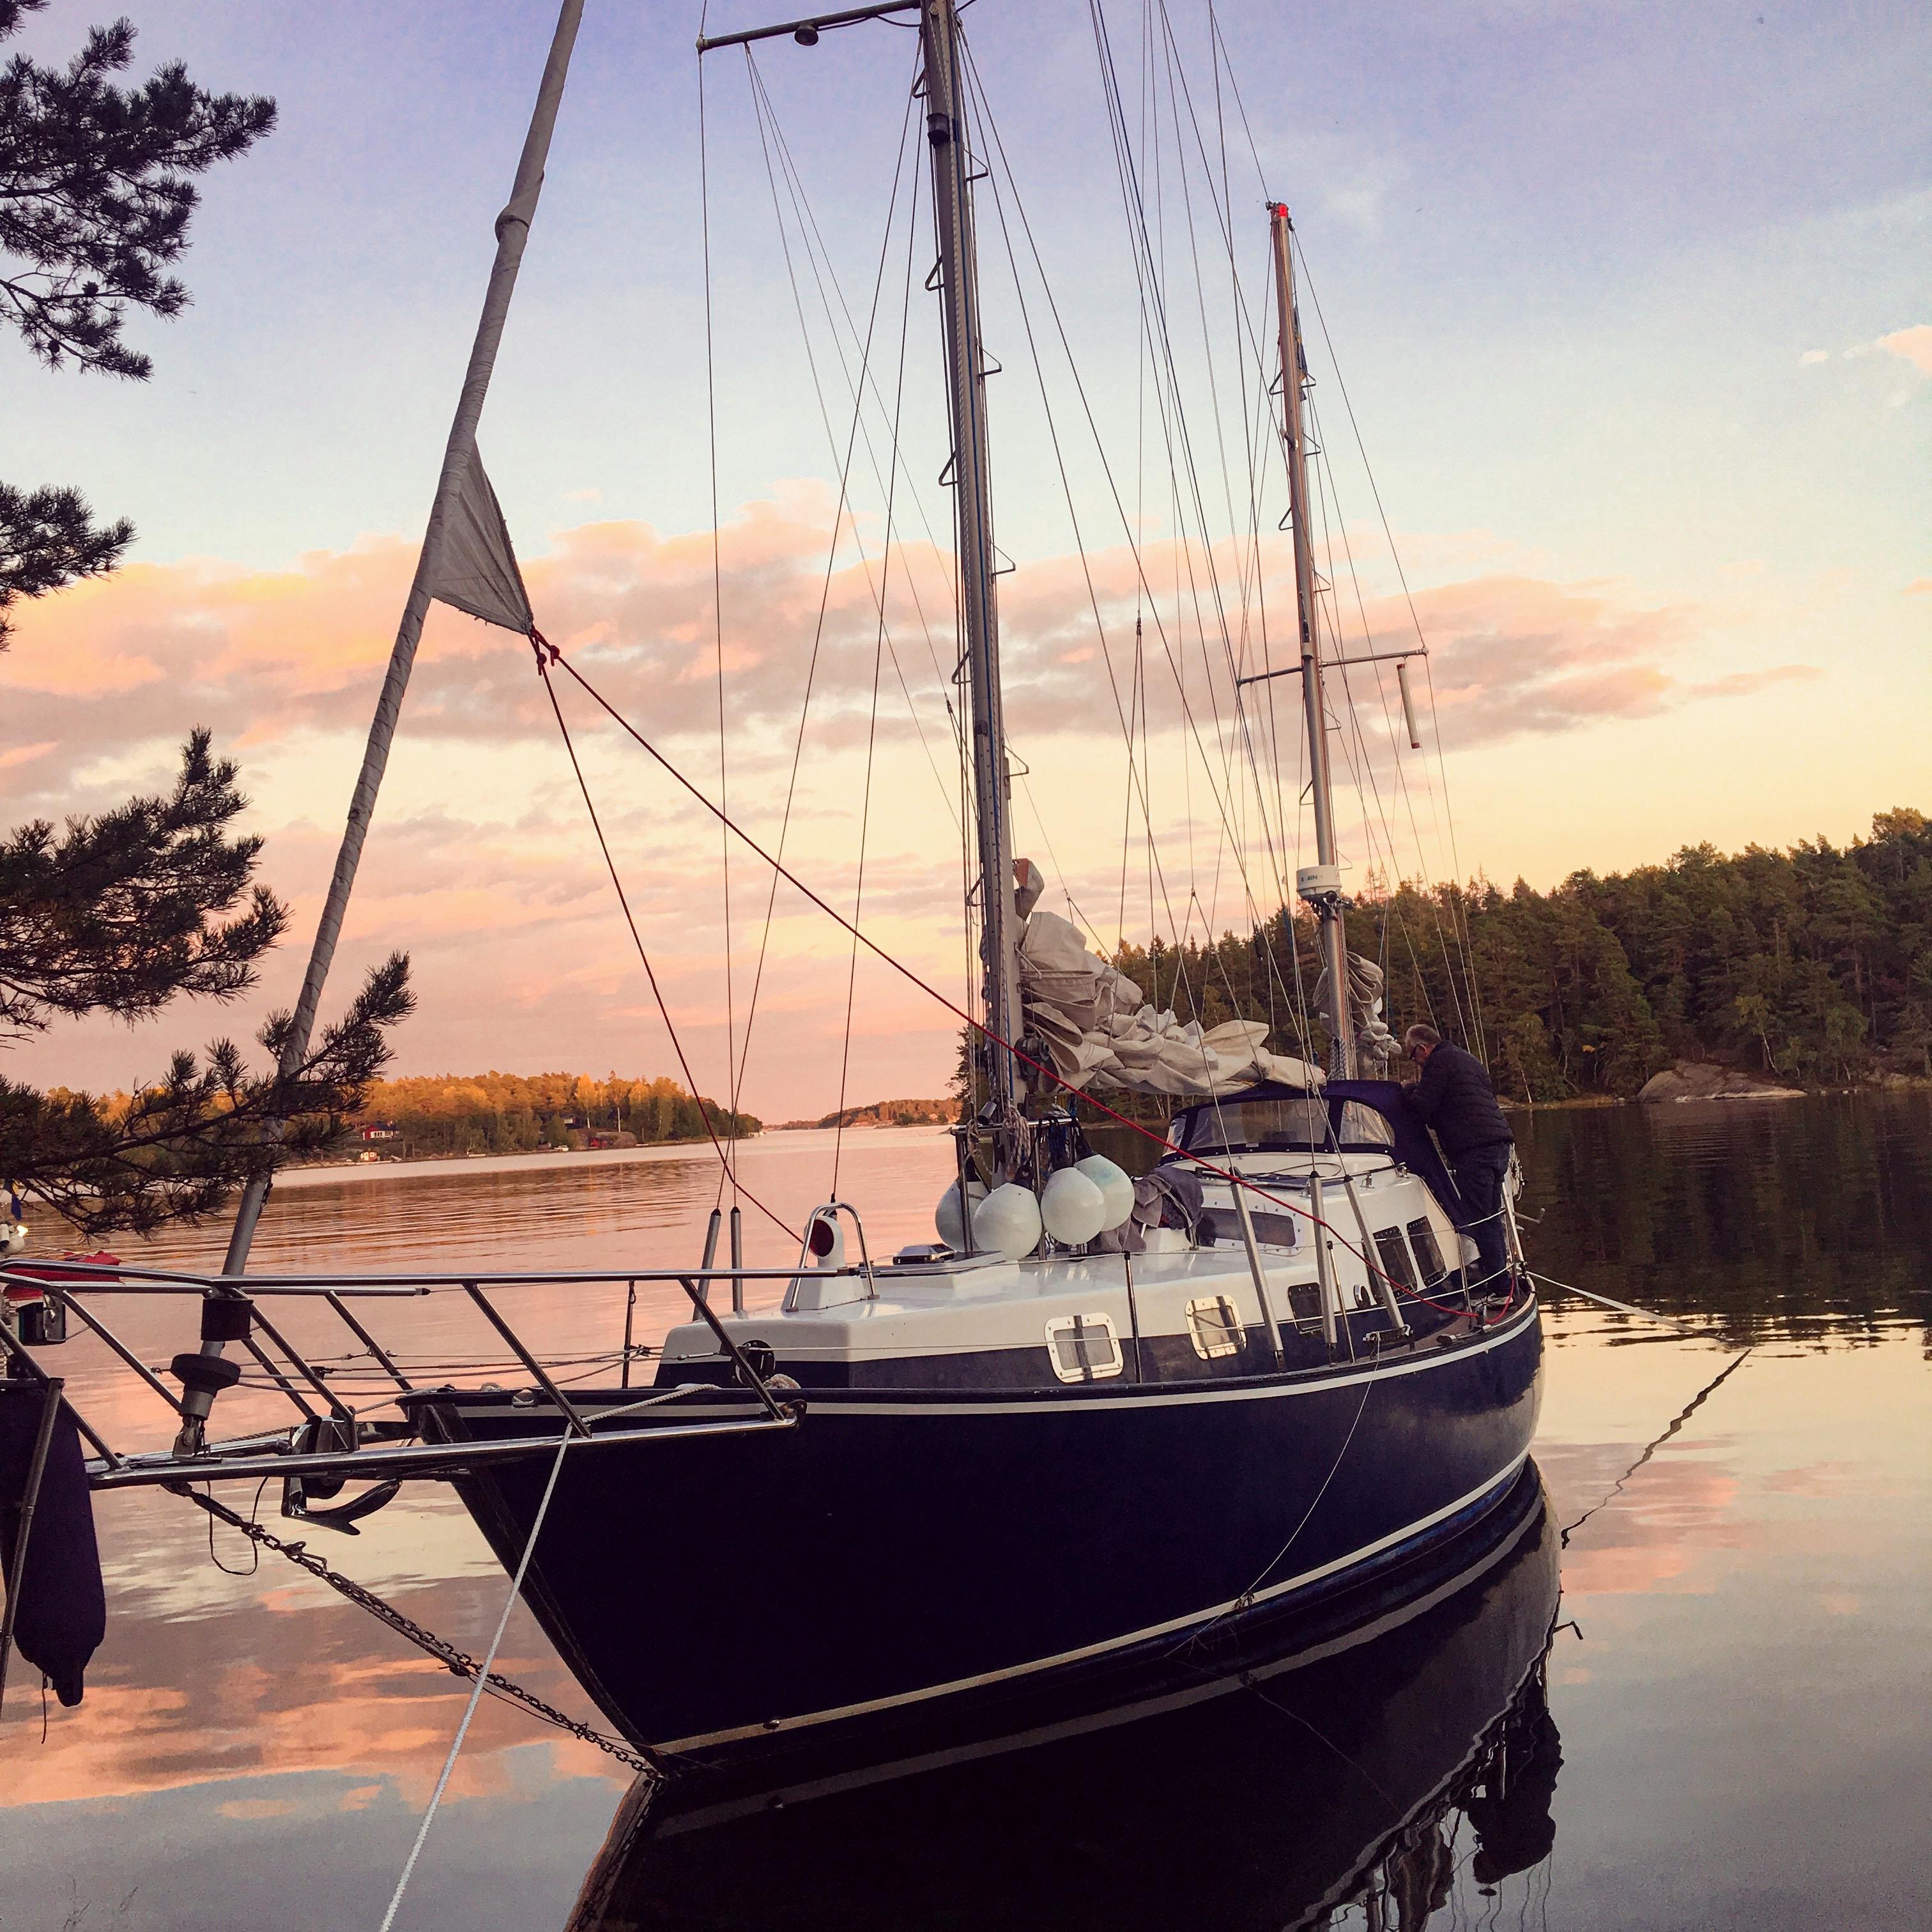 Lådna Stockholm archipelago.